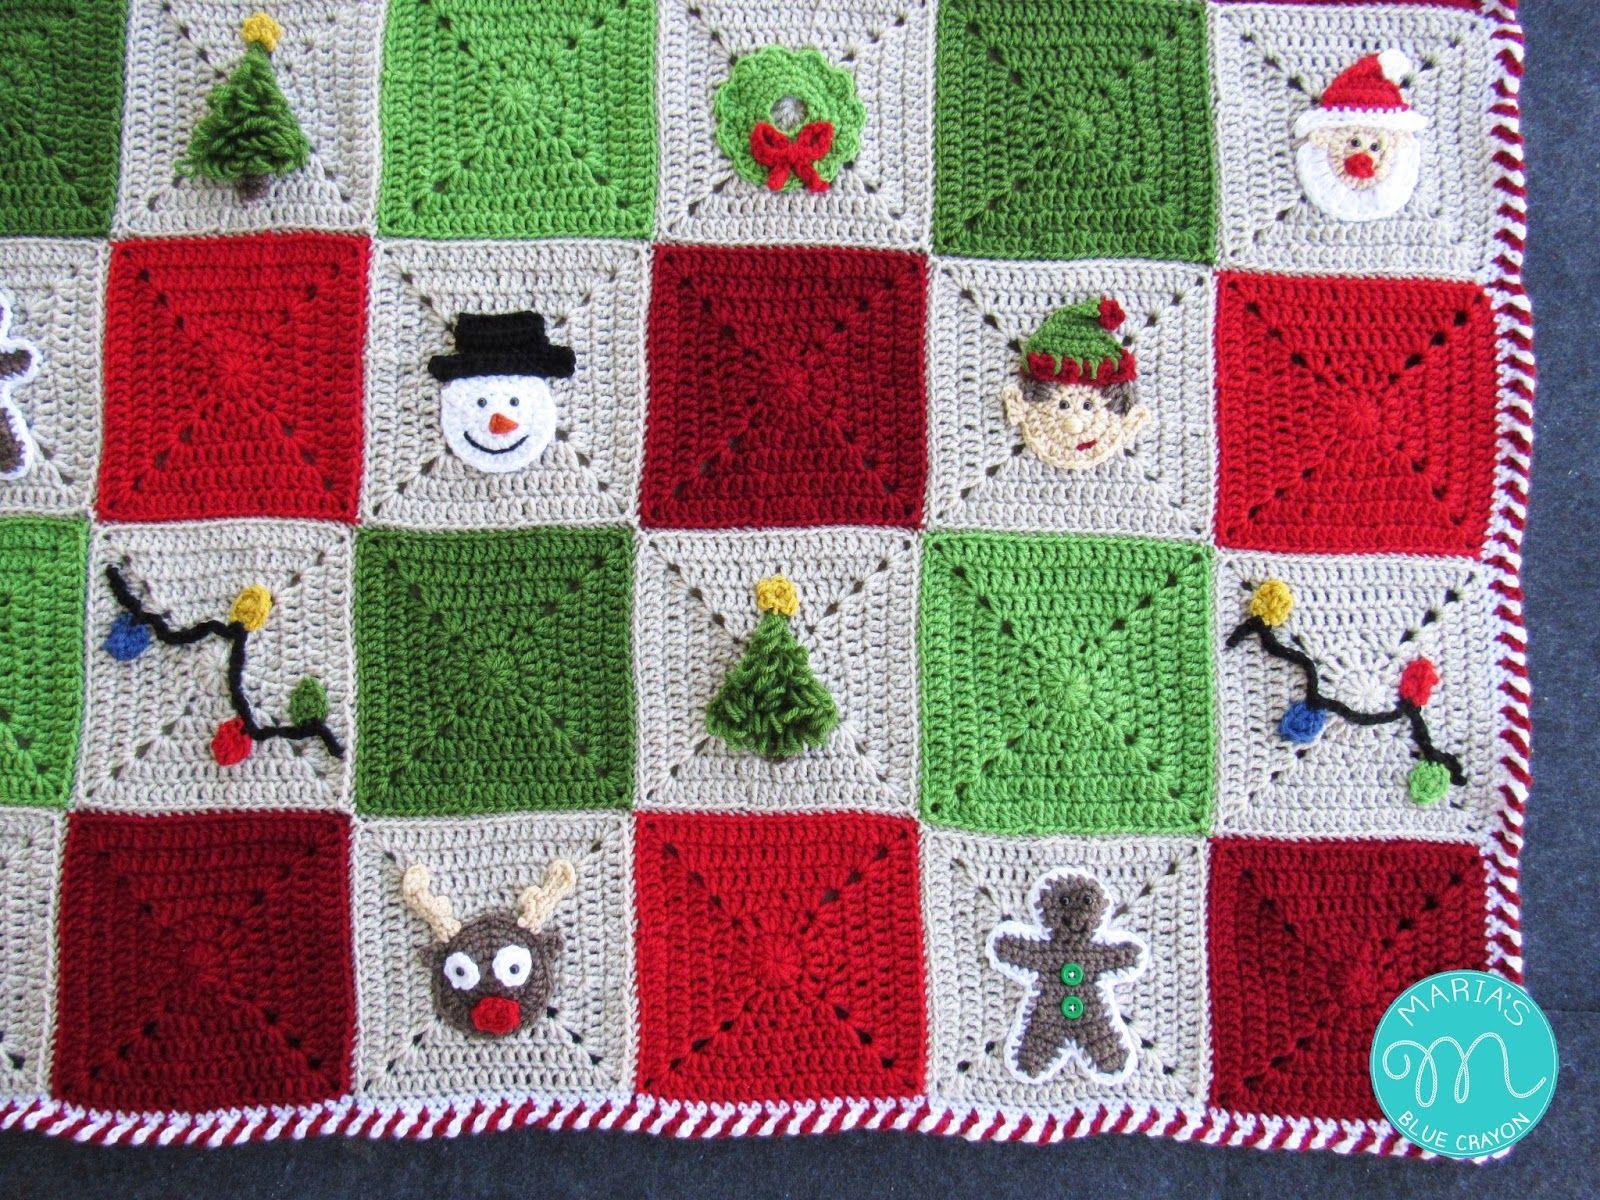 WEEK 9 - Christmas Granny Afghan CAL - Joining & Border | Crochet ...